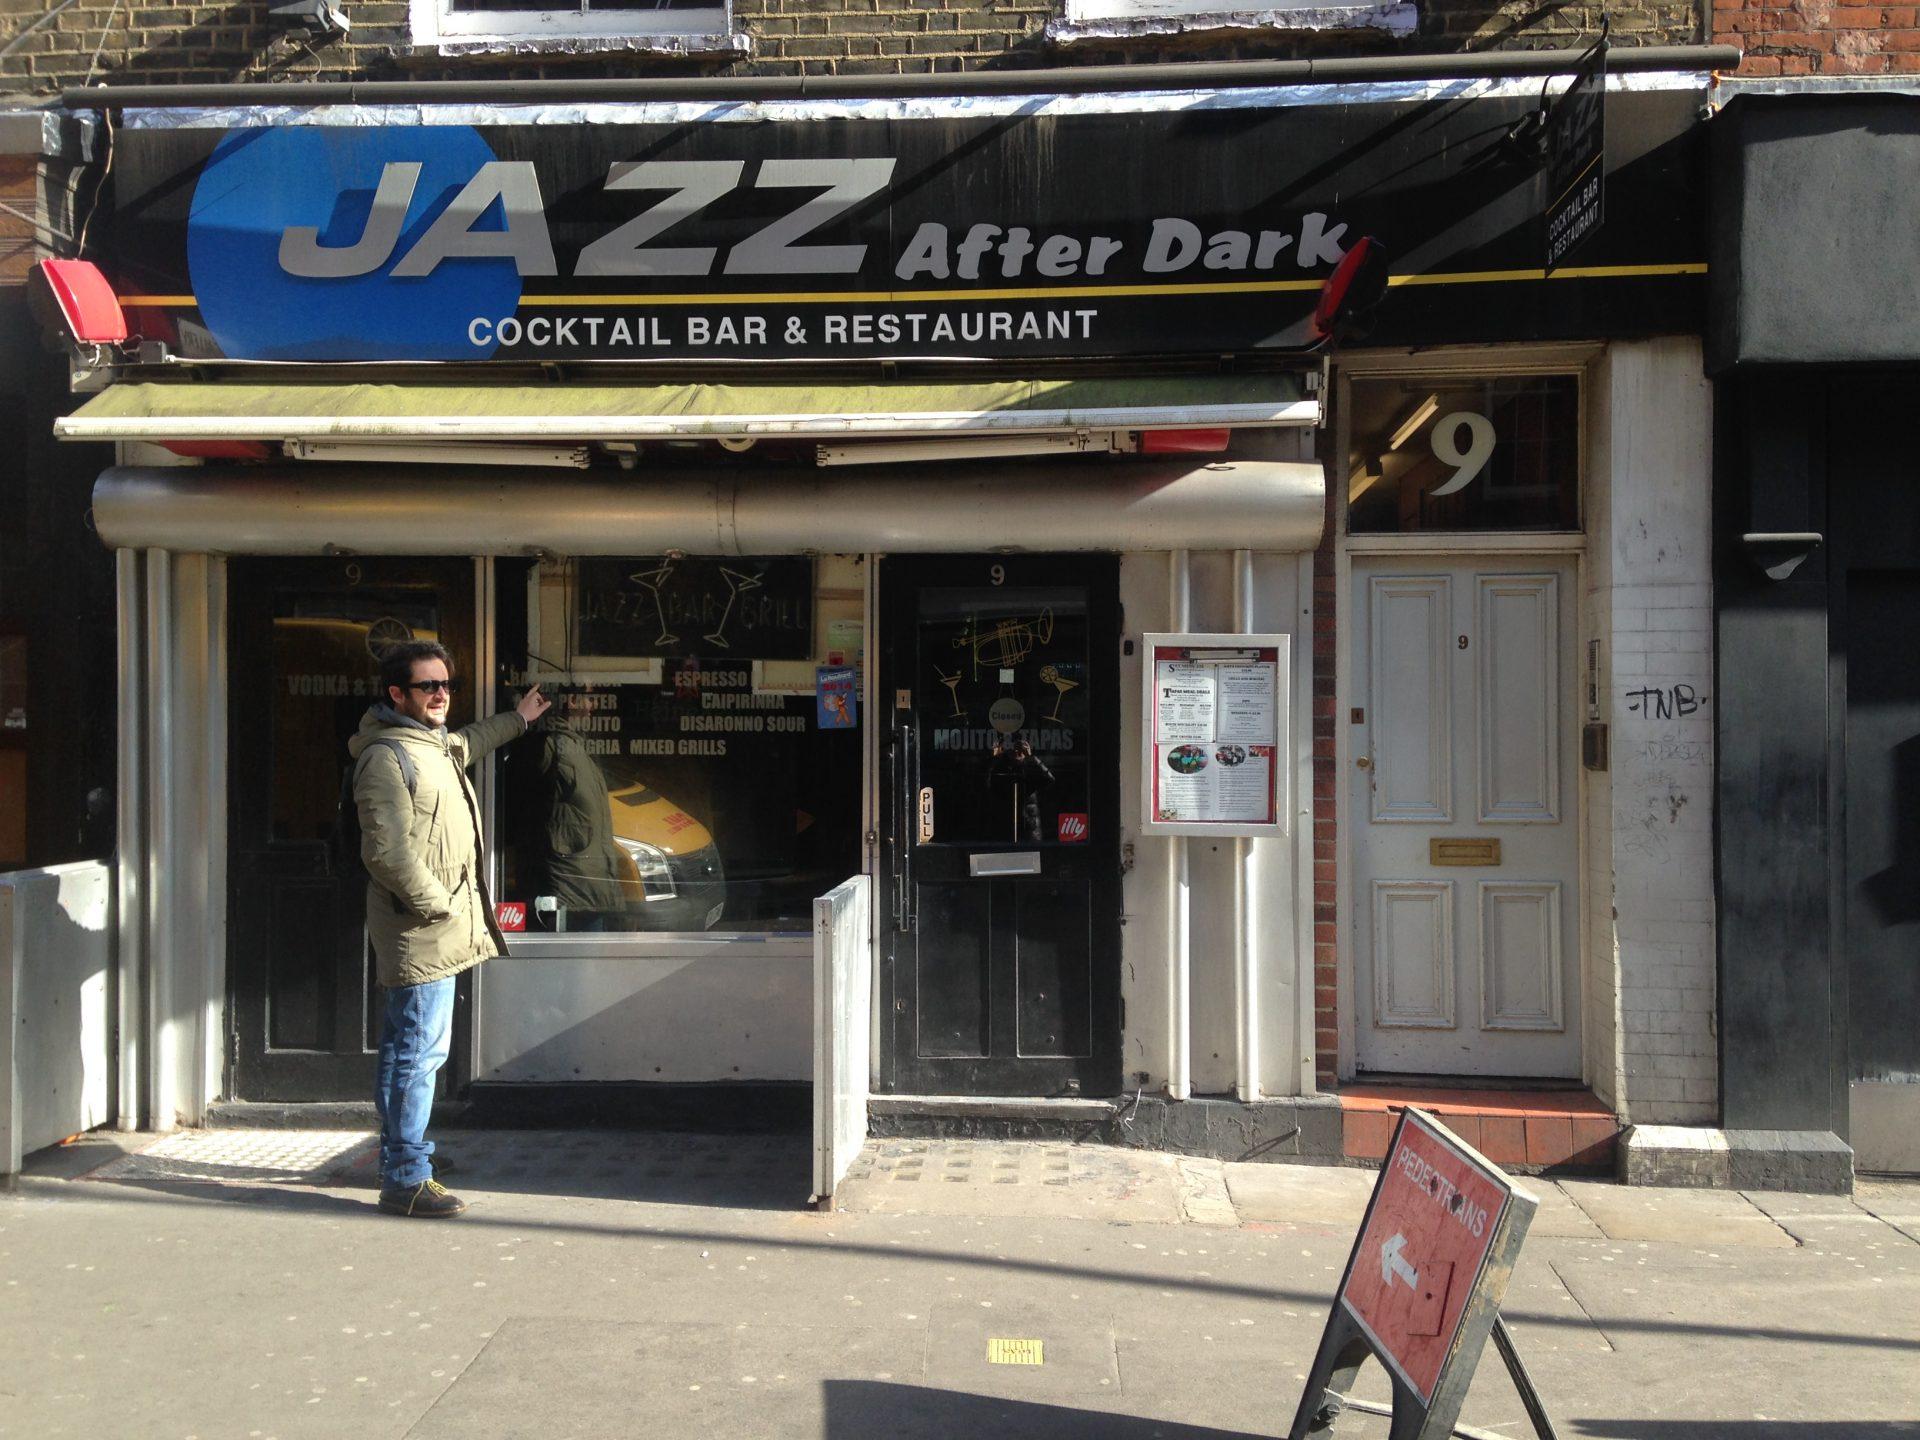 Marco davanti al Jazz After Dark